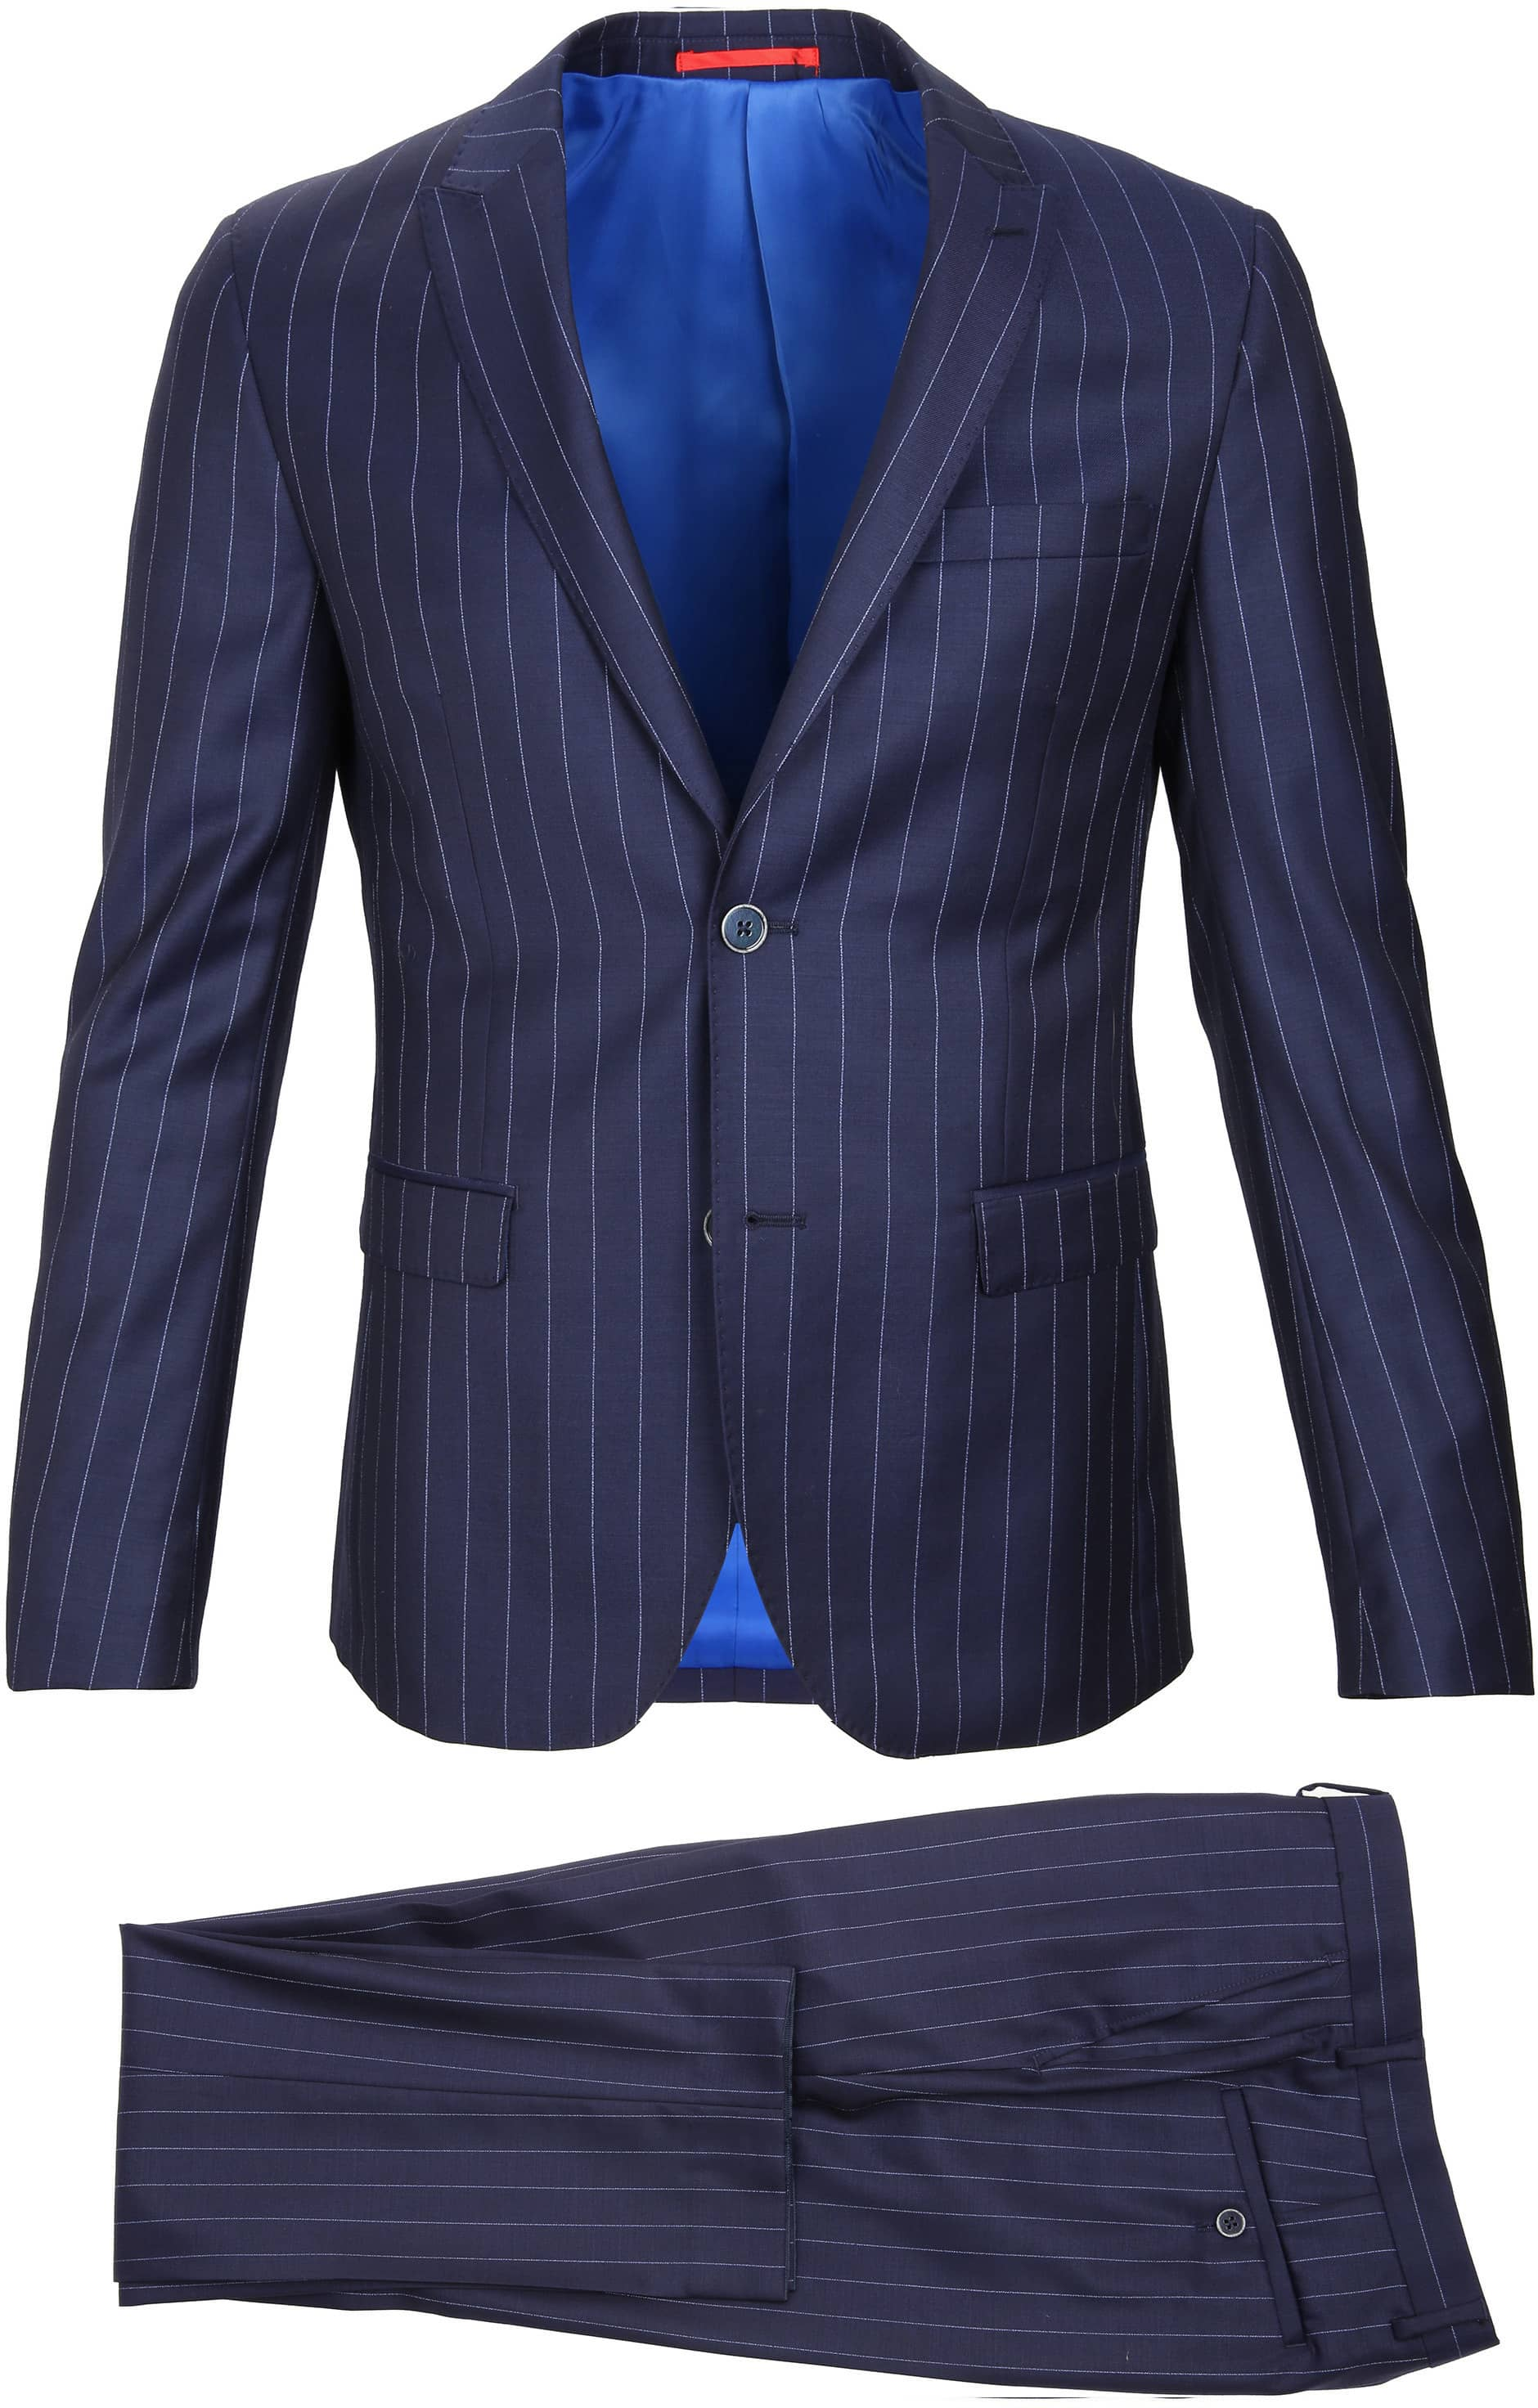 ca6a03c873ab Suitable Anzug Nancy Dunkelblau Streifen SPE18302 8RO05 290 online ...